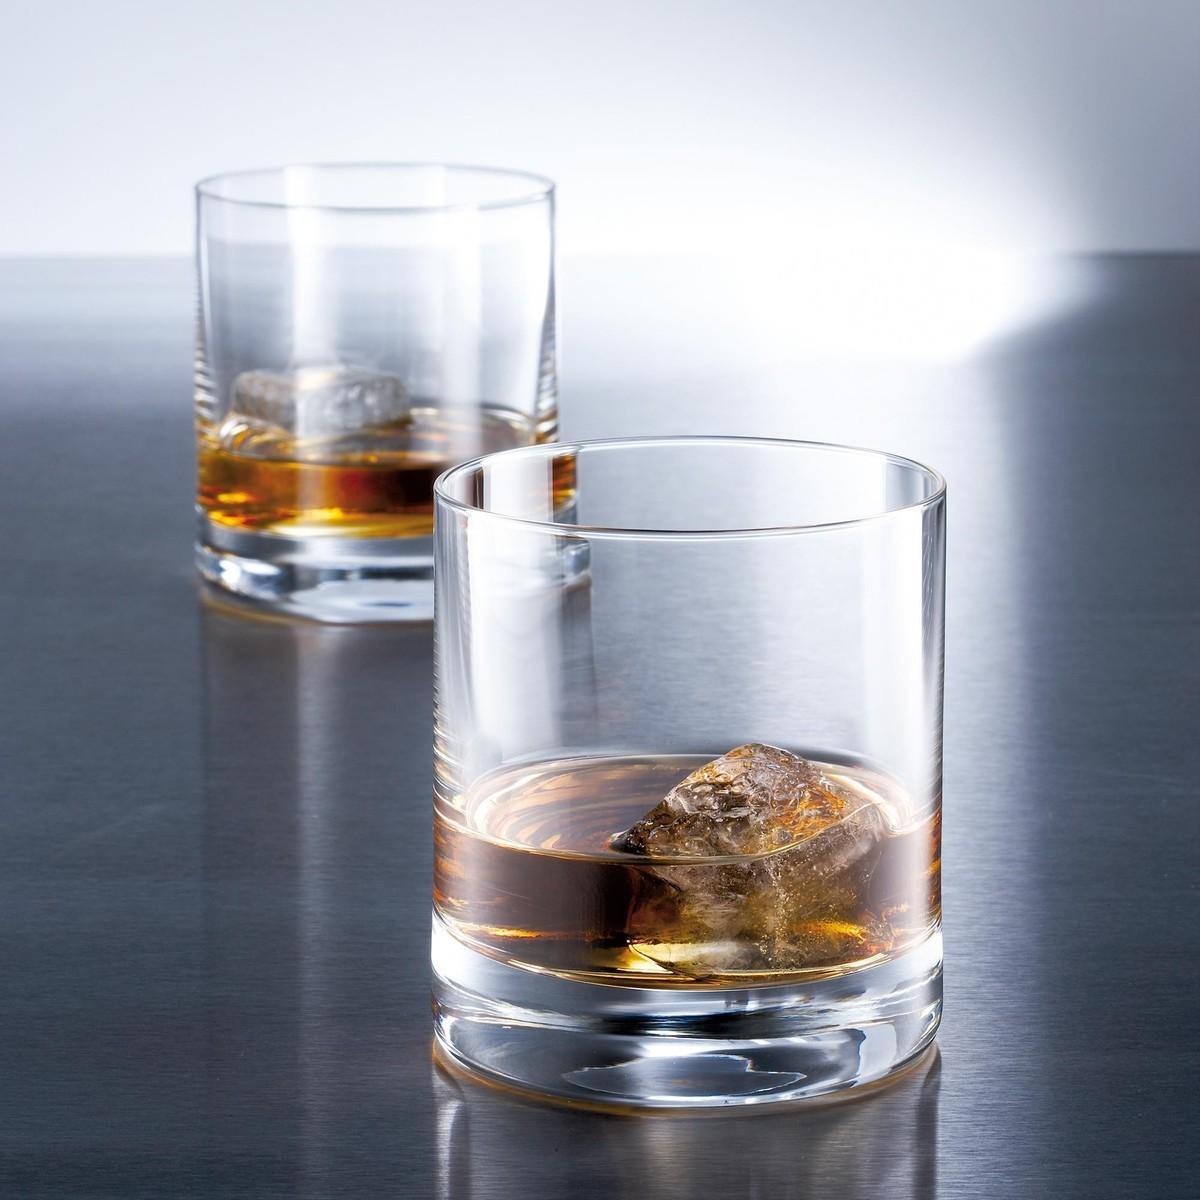 paris whisky glass set of 6 schott zwiesel. Black Bedroom Furniture Sets. Home Design Ideas